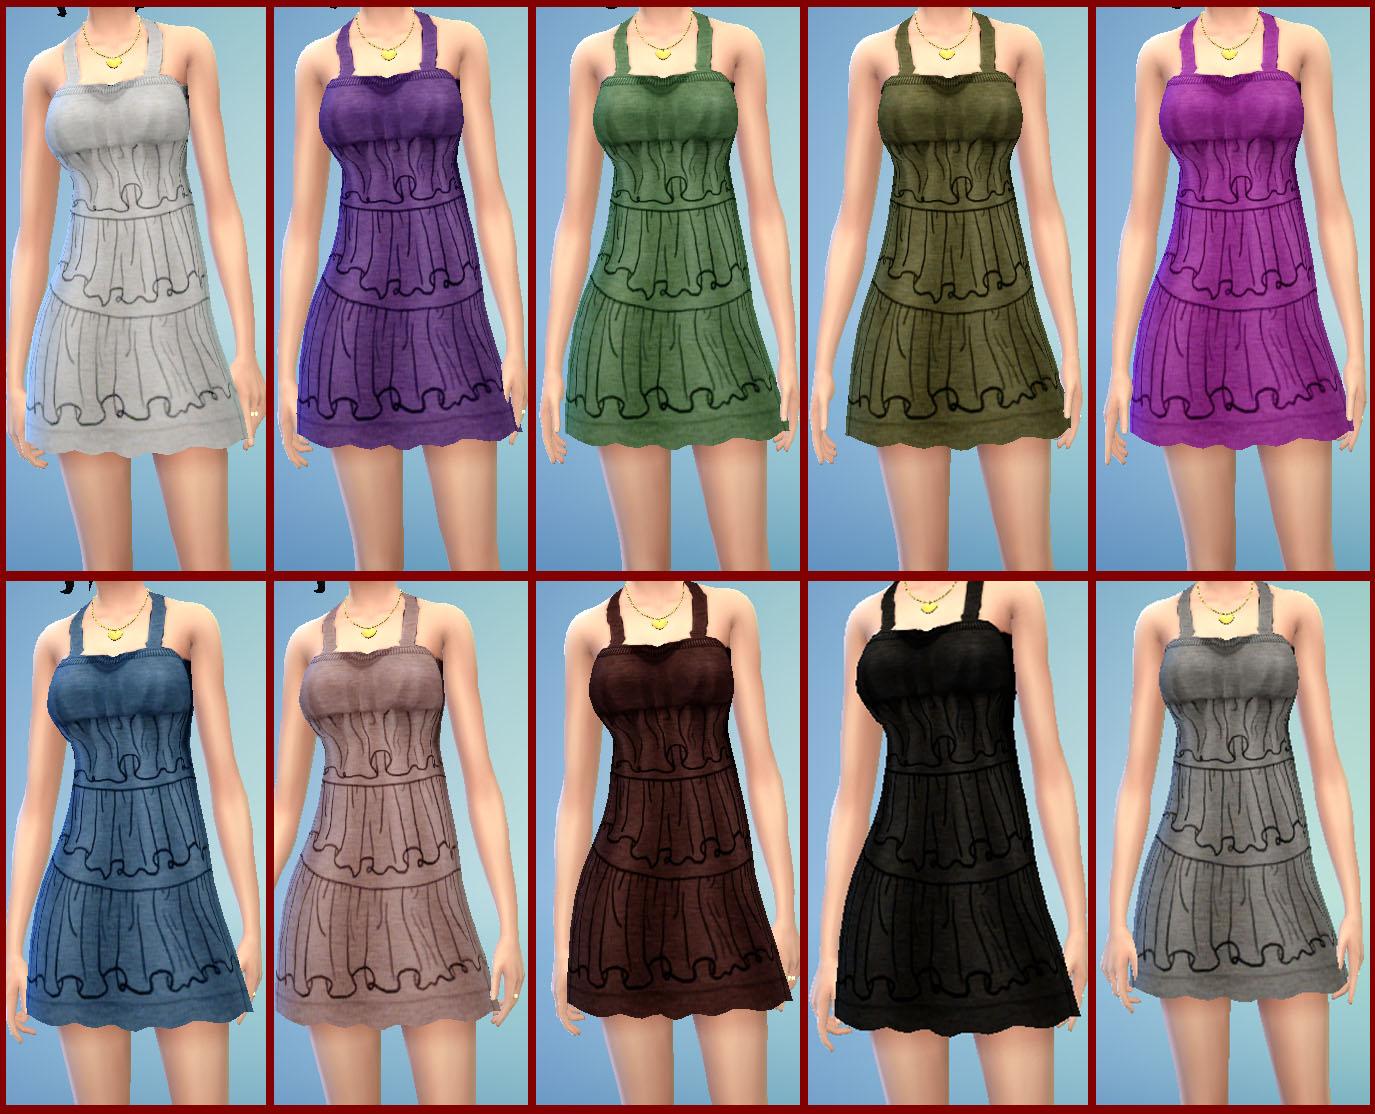 the sims 2 h&m fashion stuff free download